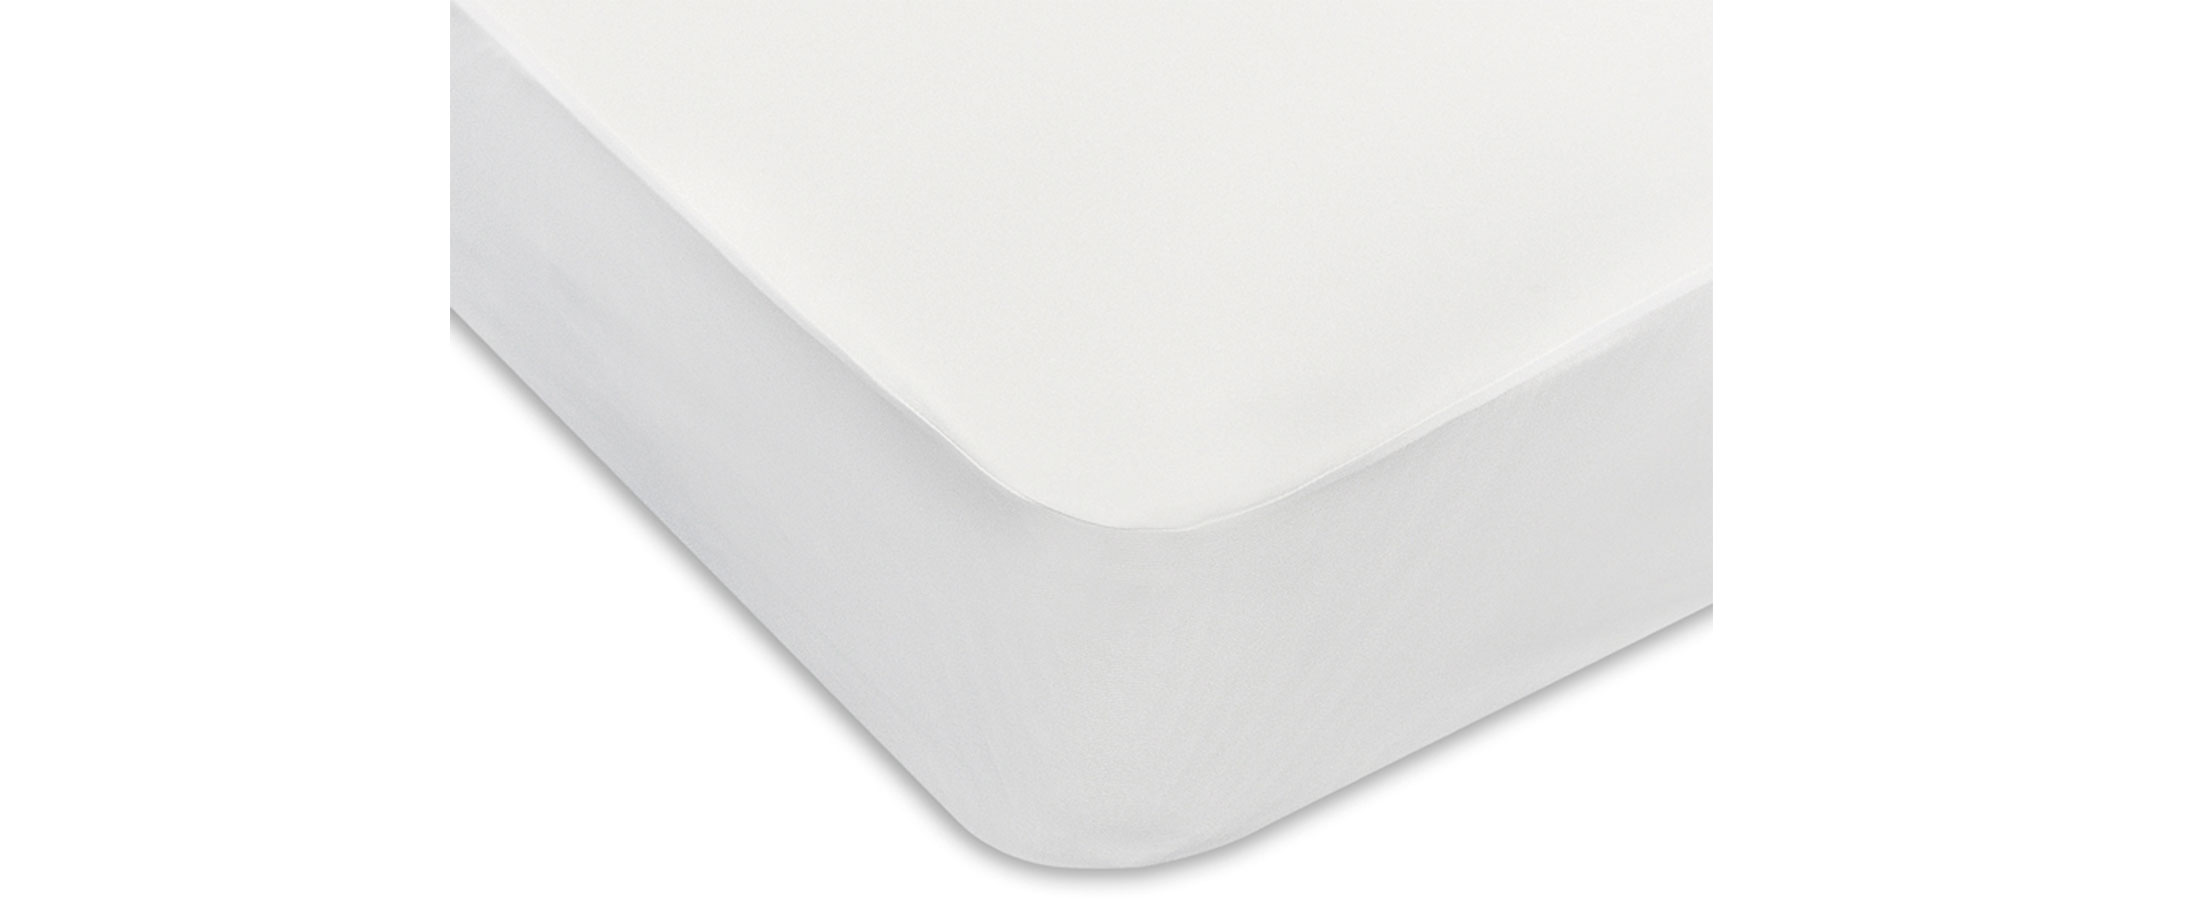 Чехол на матрас Protect-a-bed 90х200Чехол на матрас Protect-a-bed 259 - 90x200 см<br><br>Ширина см: 90<br>Глубина см: 200<br>Высота см: 1<br>Материал: Ткань